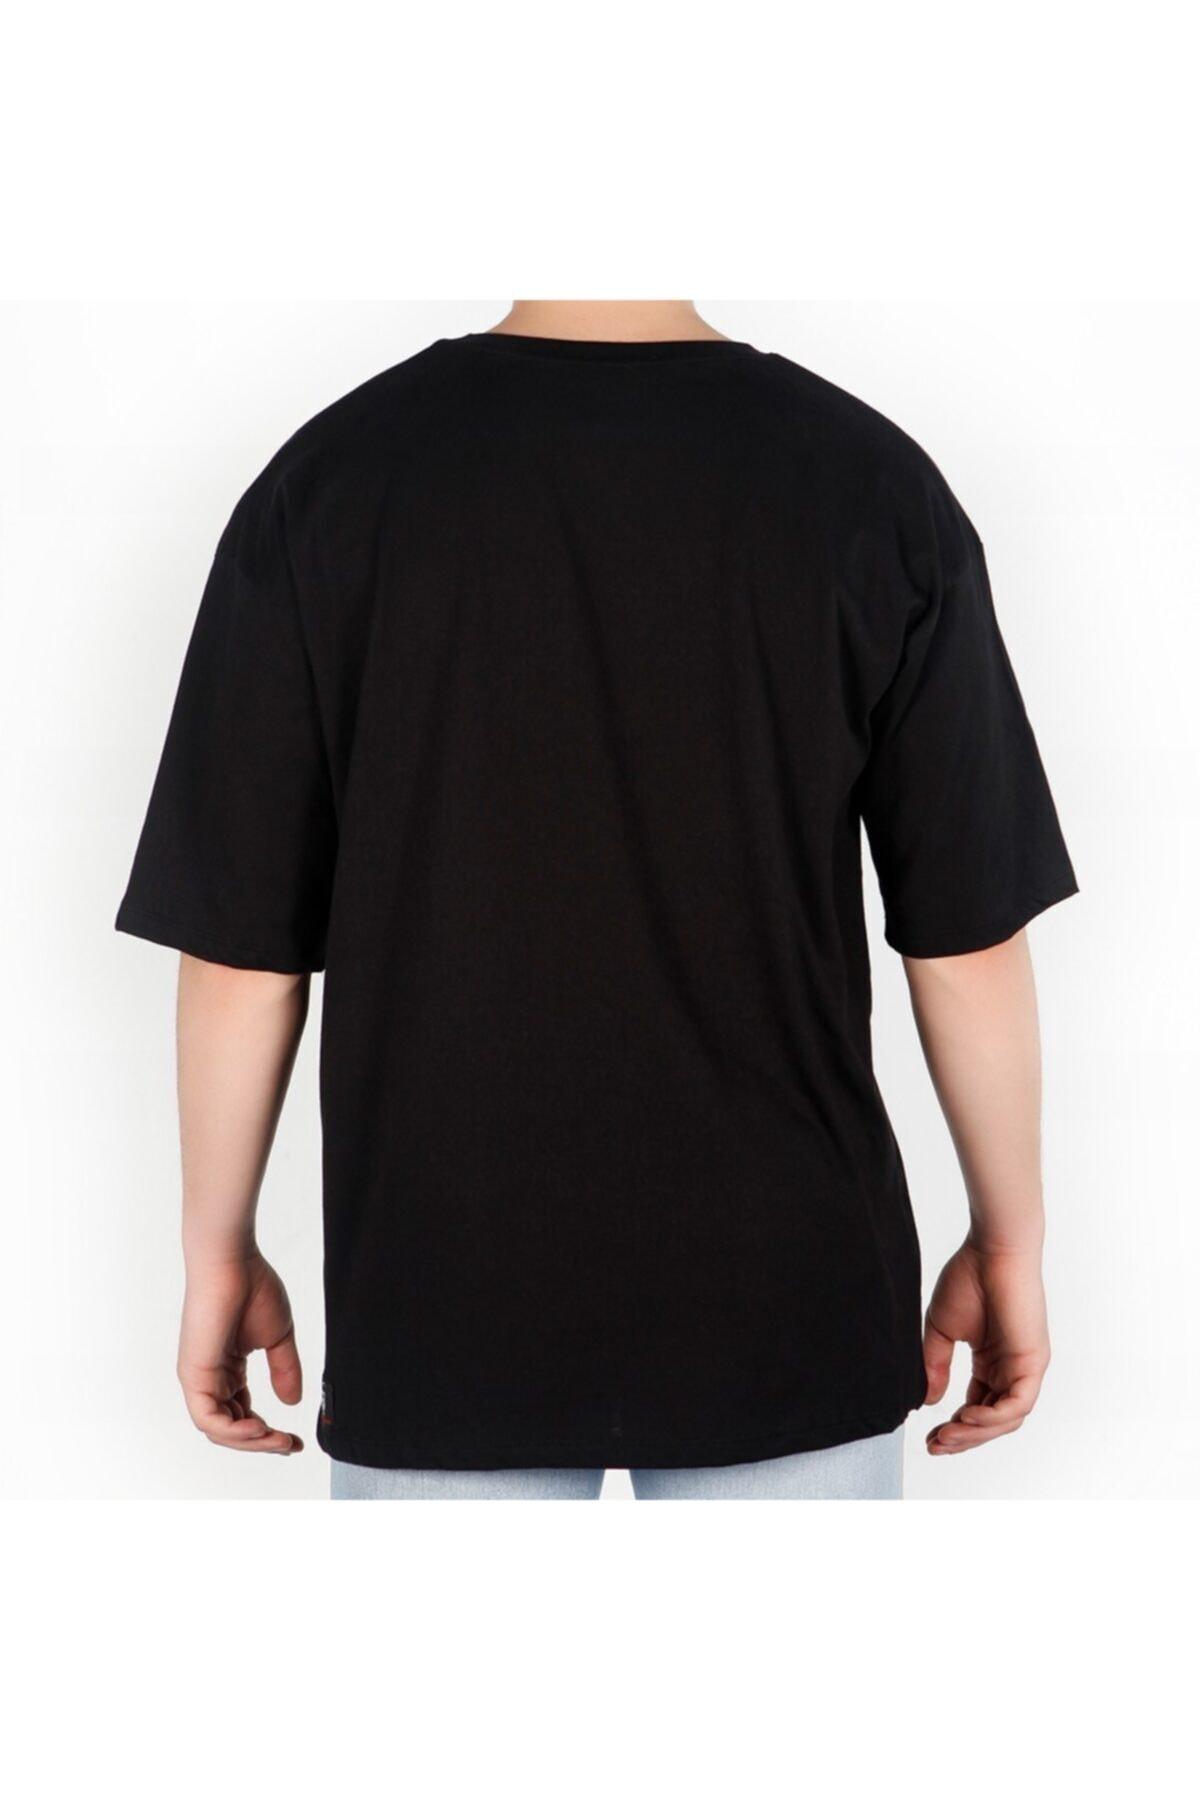 Griff st Unisex Bad Money T-shirt Black 2